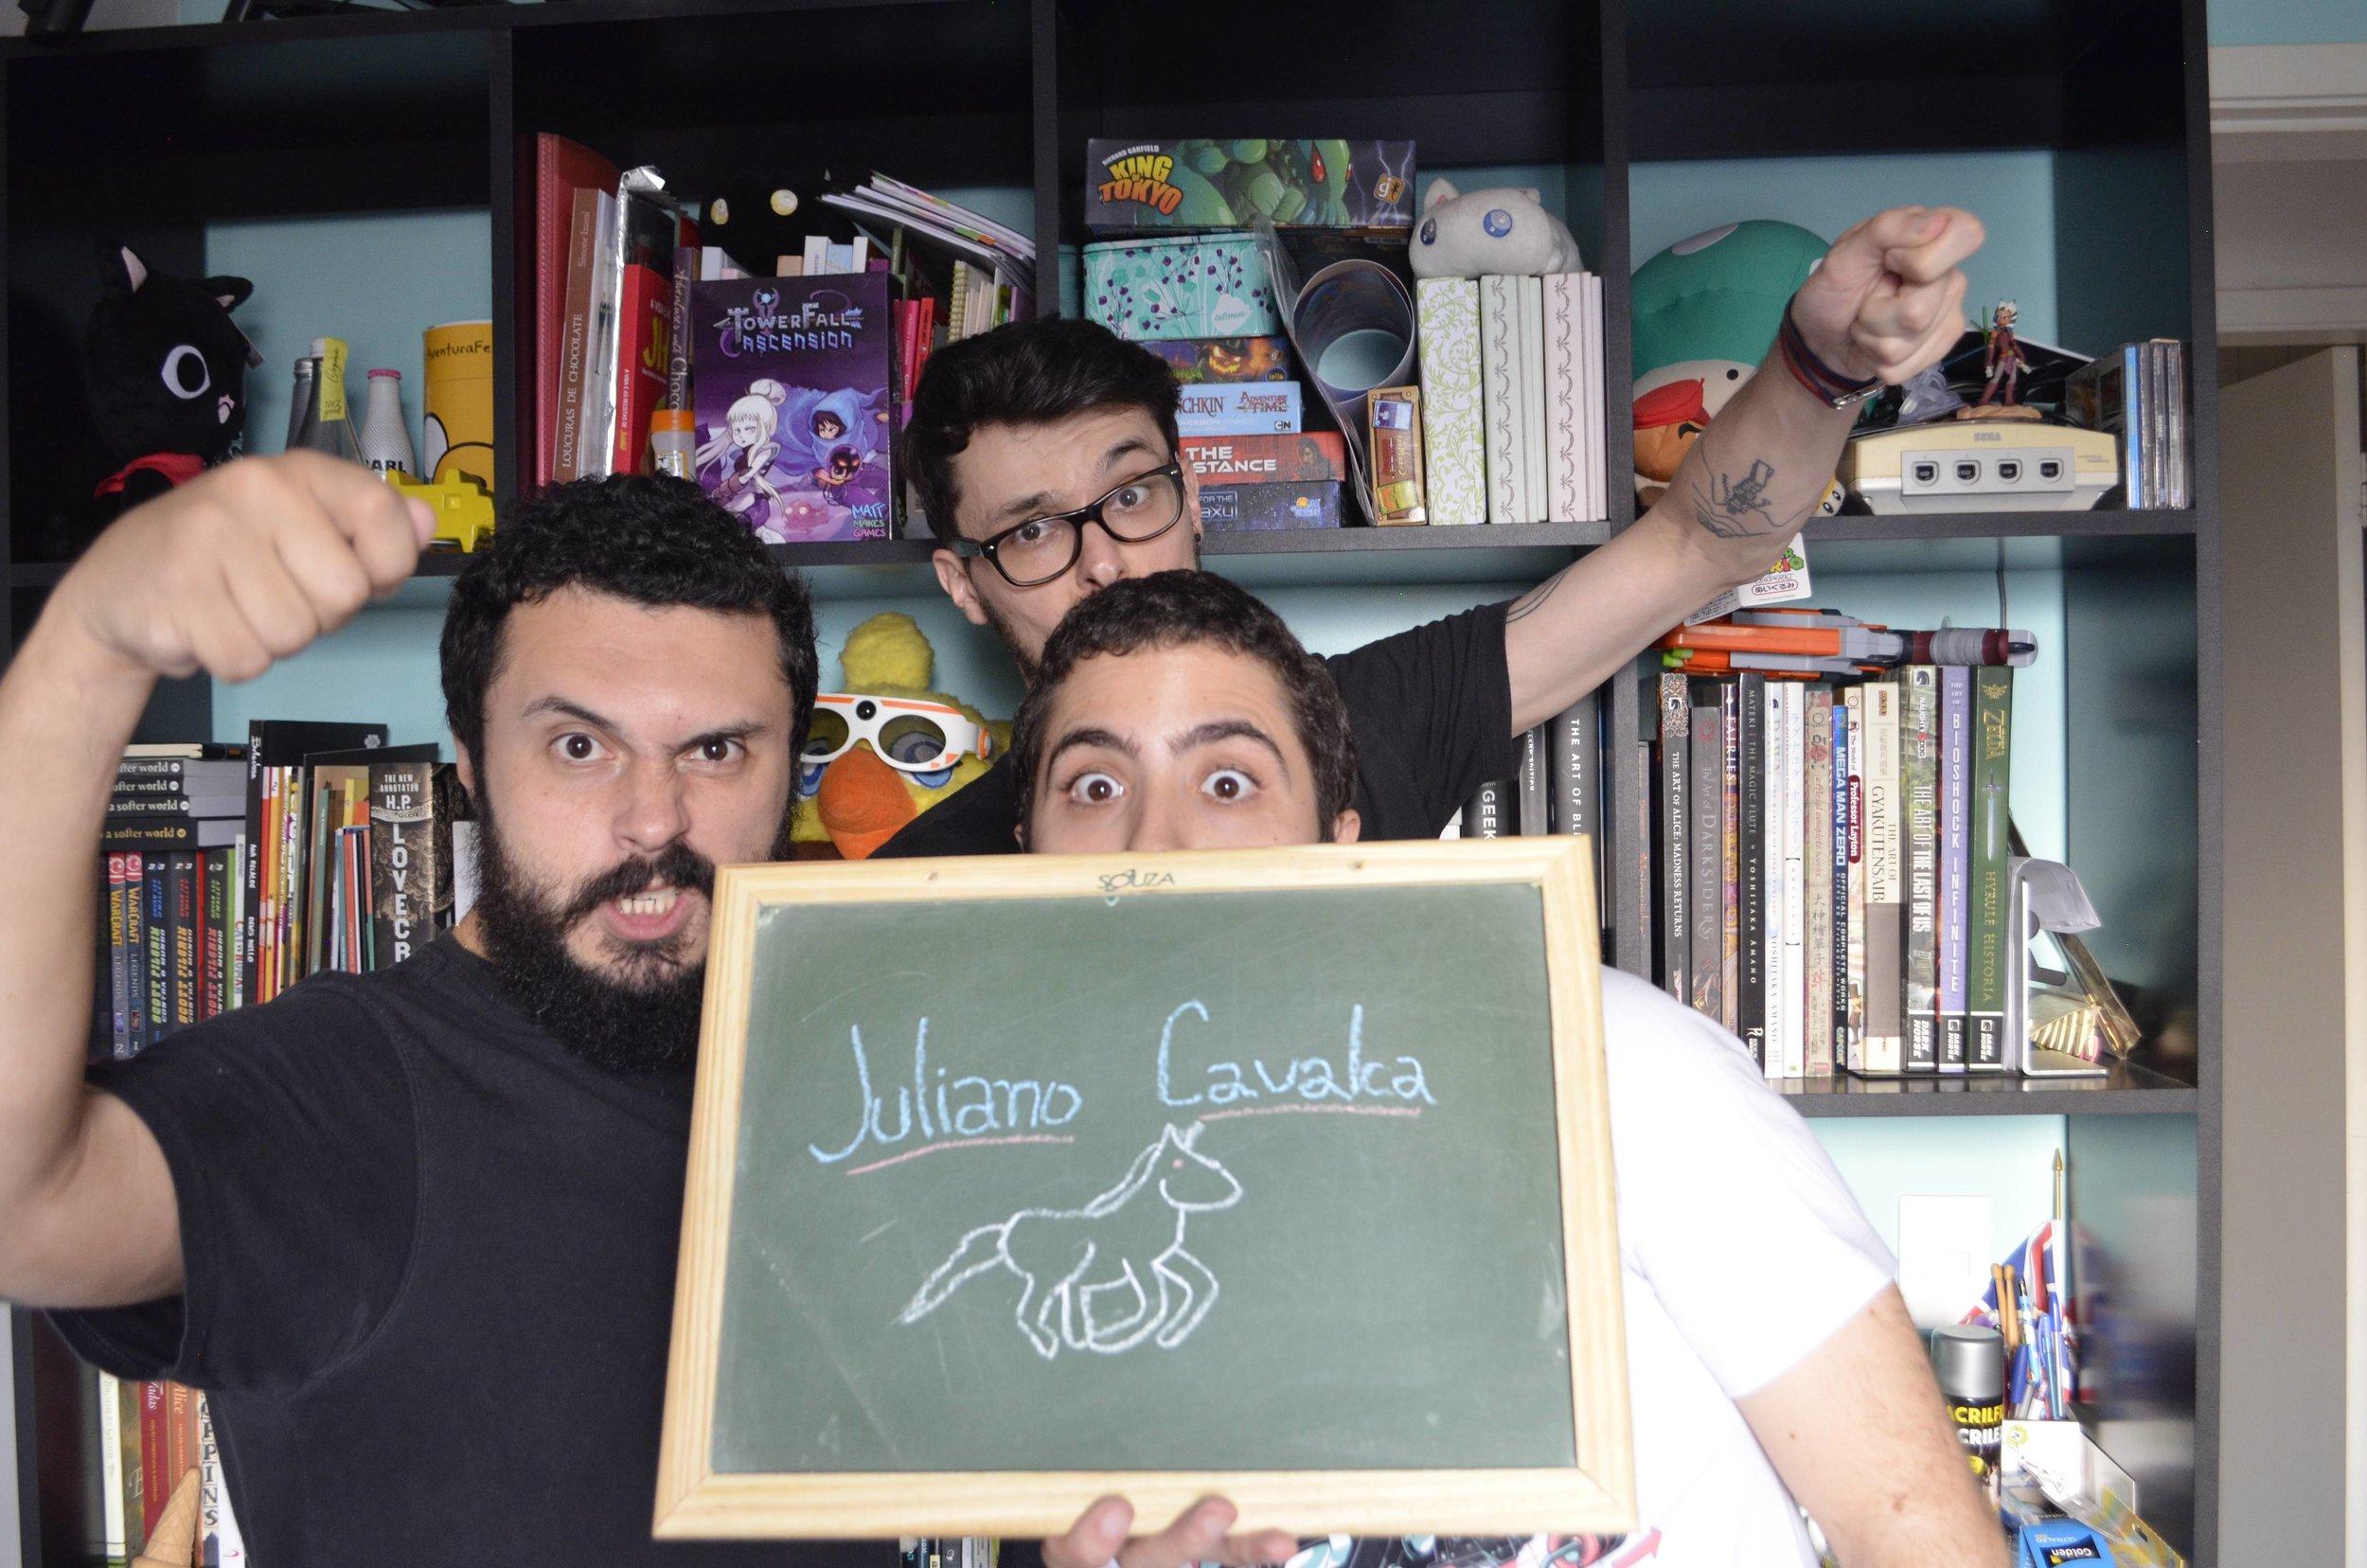 Juliano-Cavalca.jpg